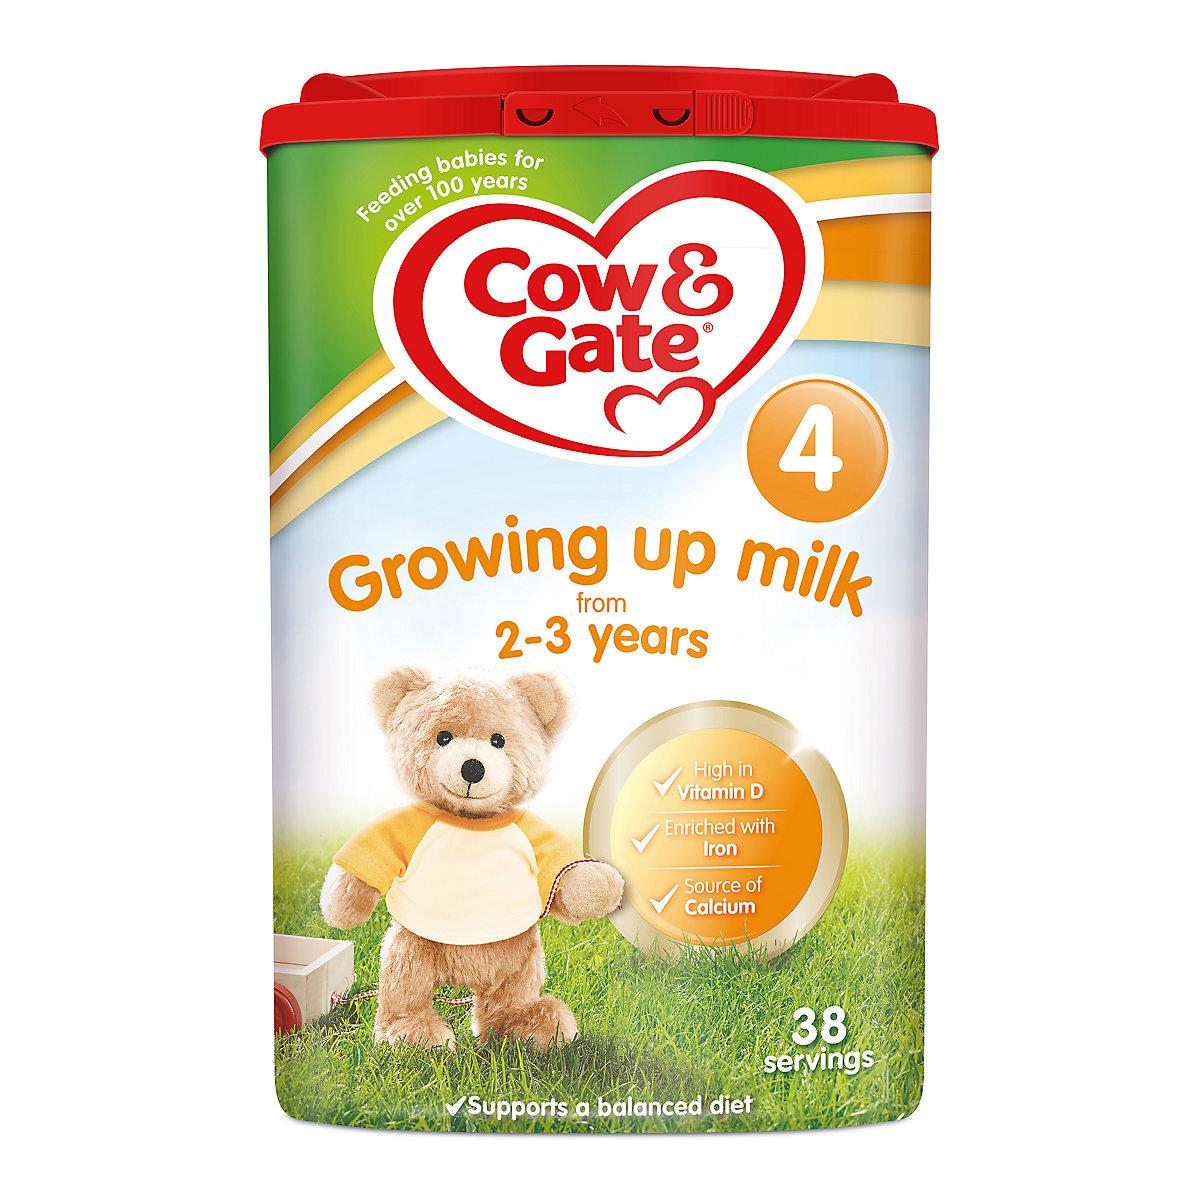 Cow & Gate 4 growing up milk formula 800g